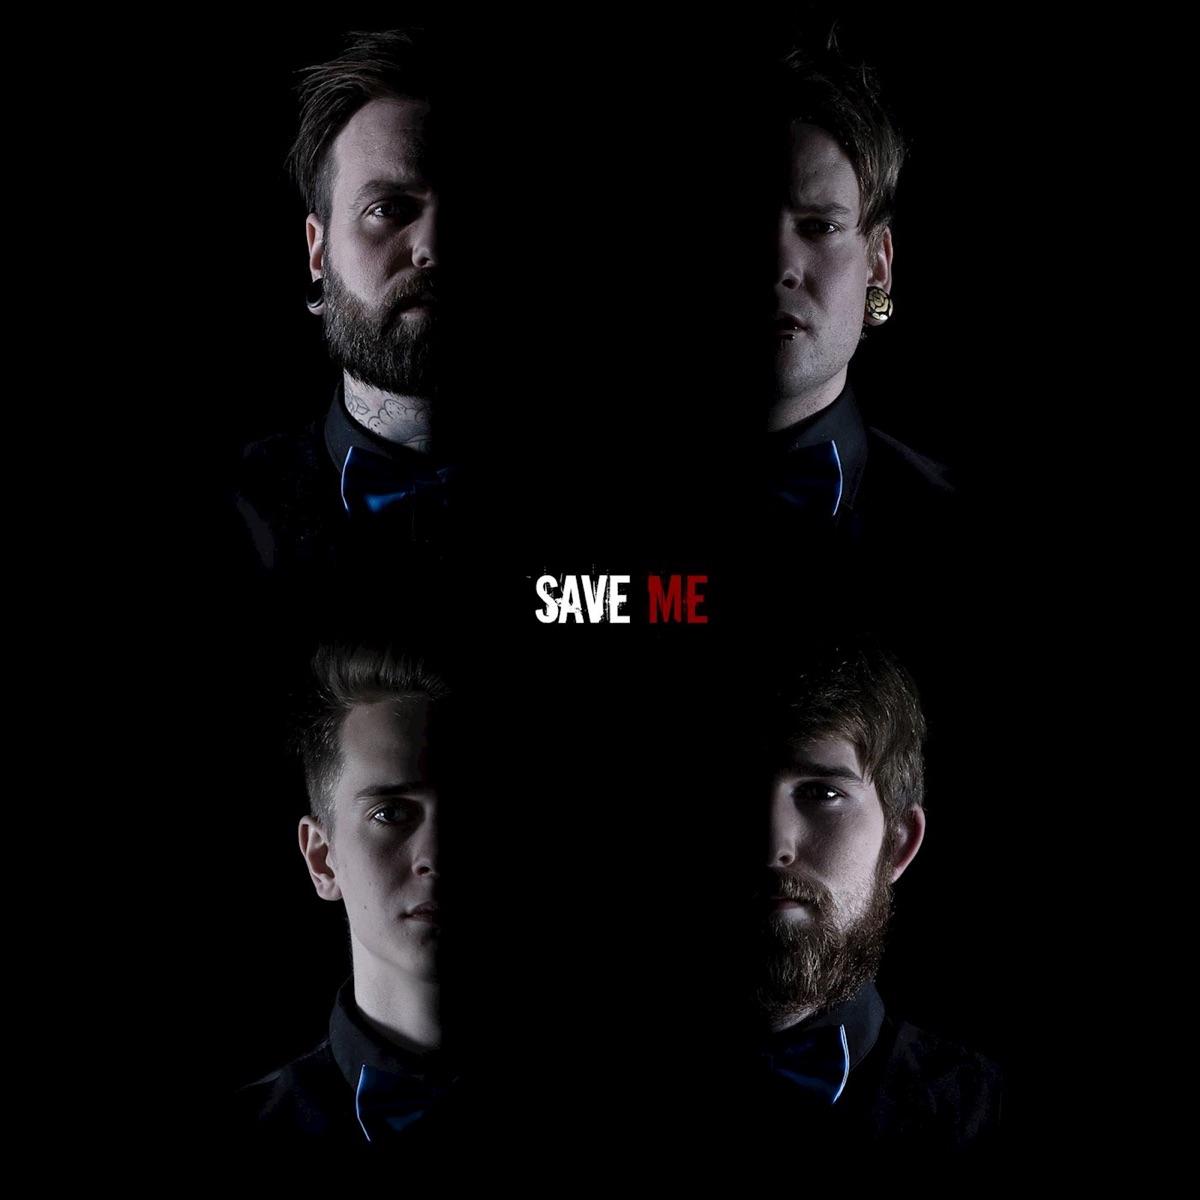 Save Me feat Annika Hajgato - Single Writing the Future CD cover